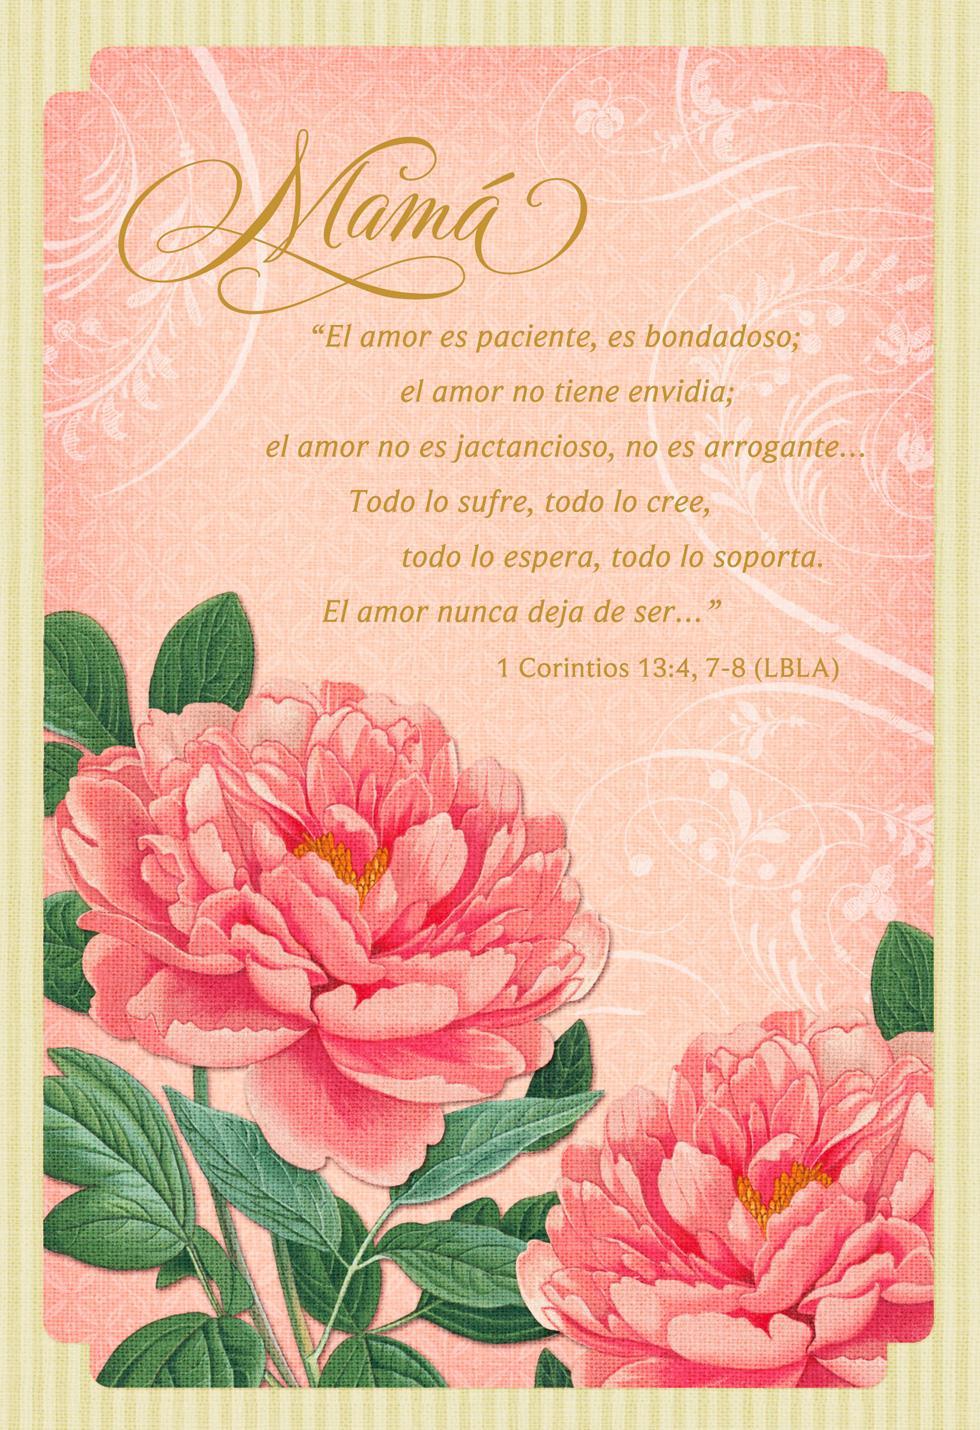 Flowers for mom spanish language valentines day card greeting flowers for mom spanish language valentines day card m4hsunfo